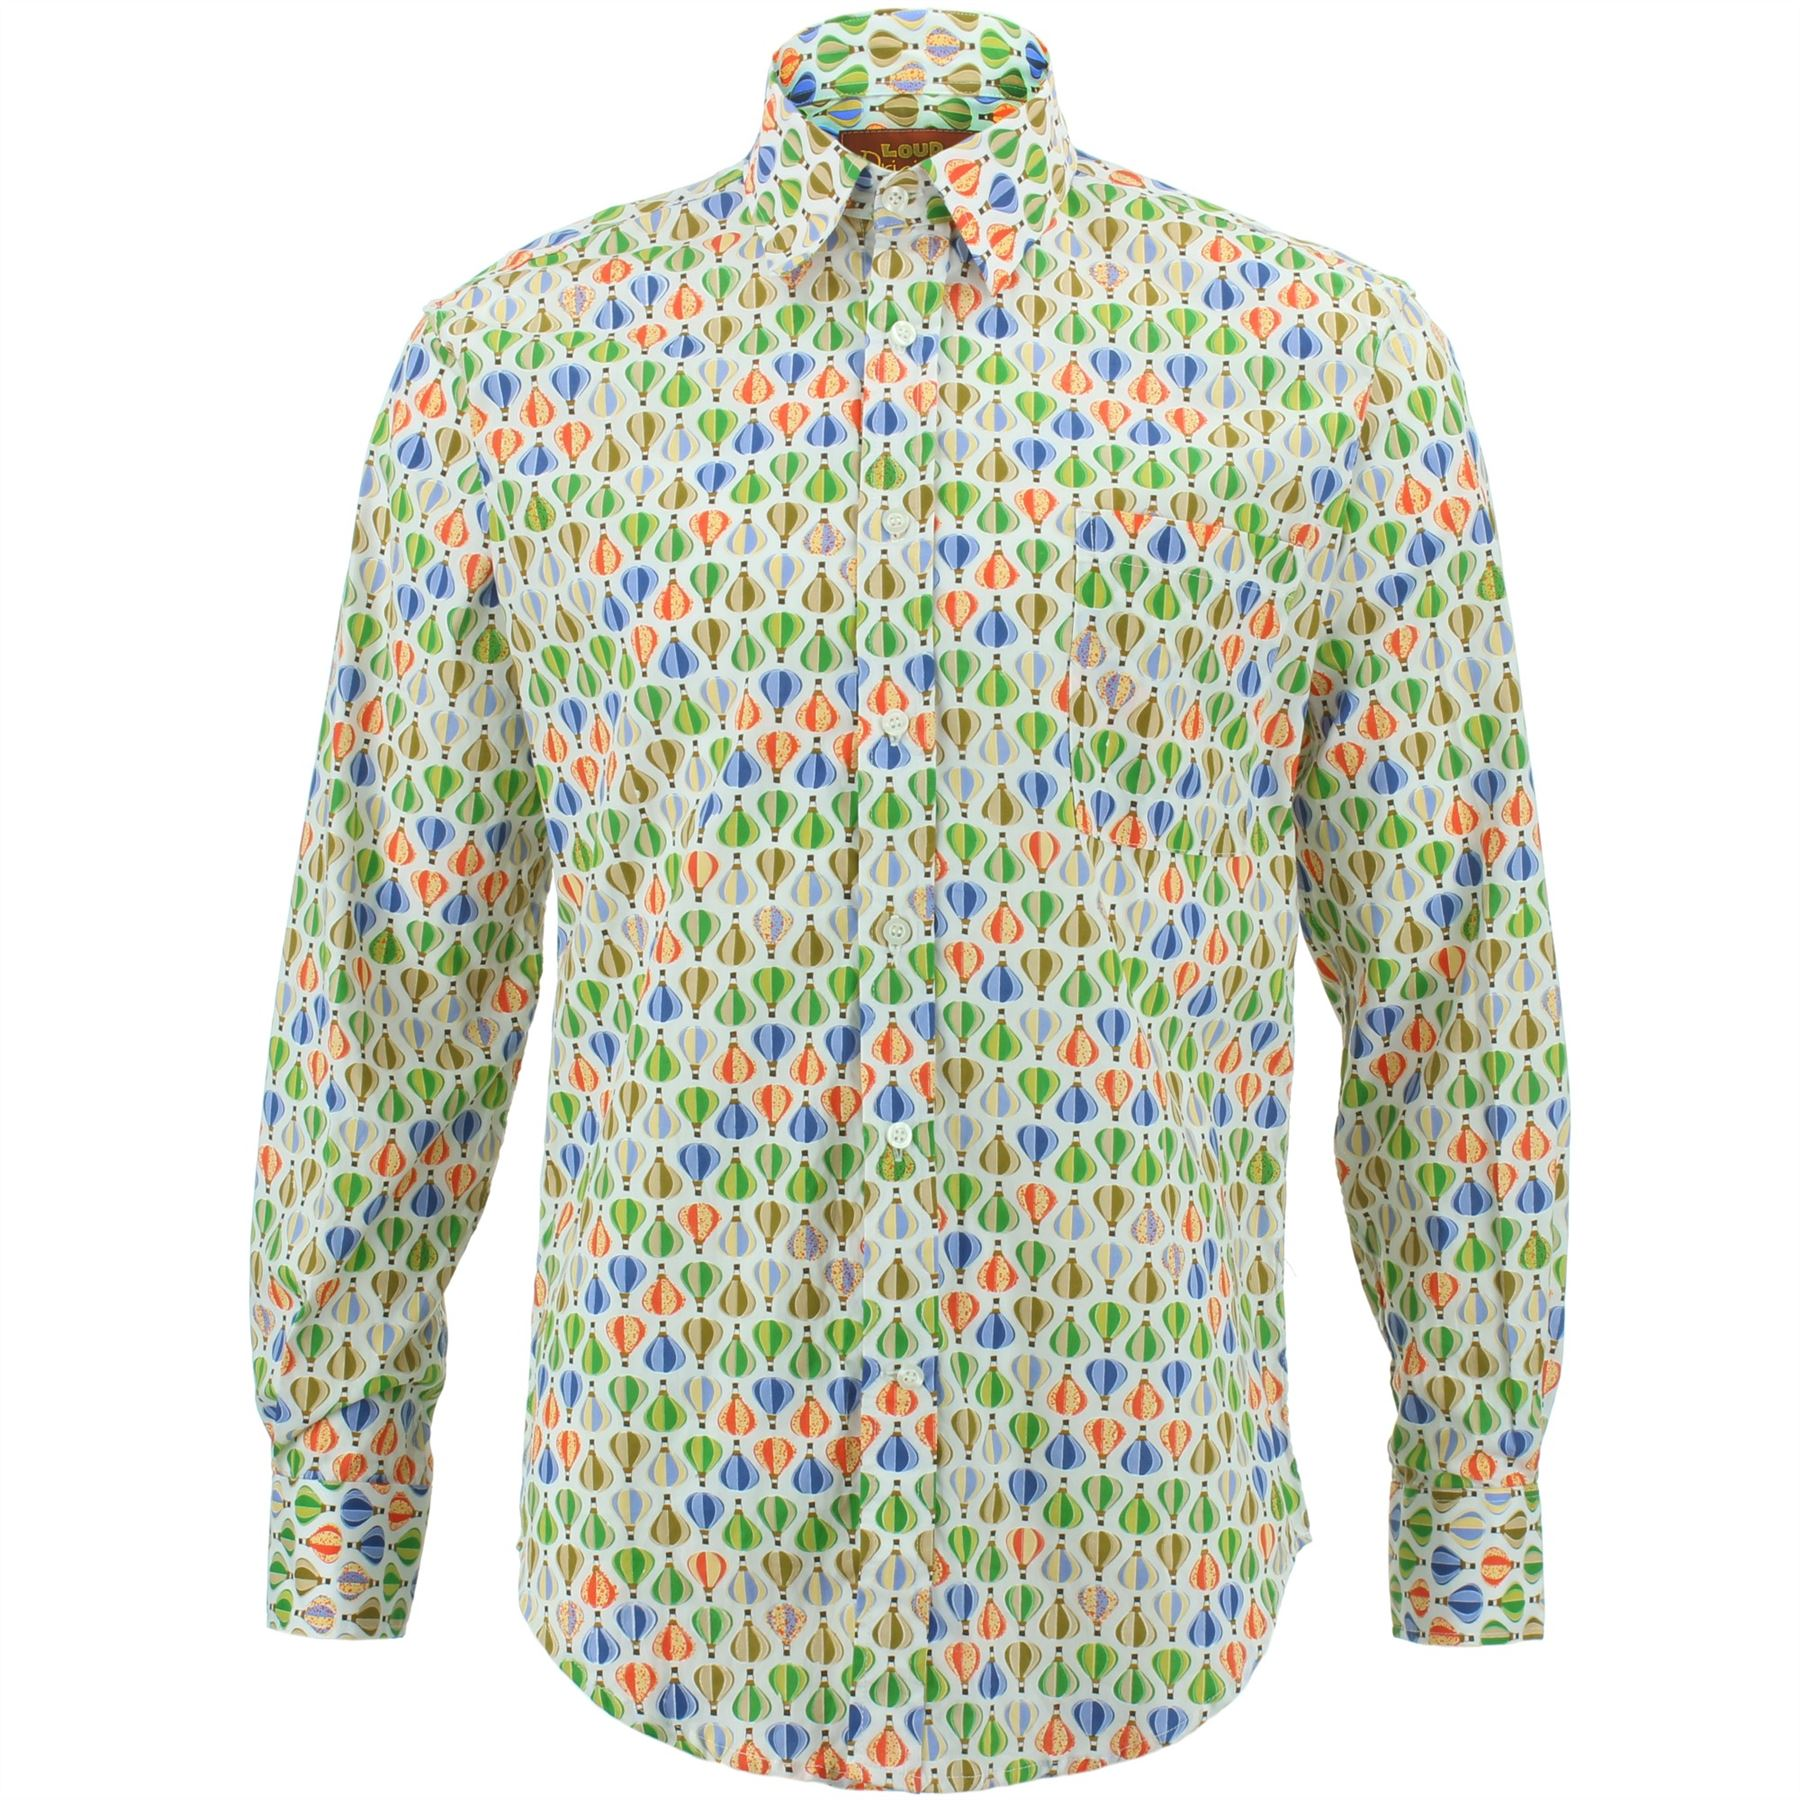 Uomo Camicia Loud Originals tailored Fit Animale Blu Rétro Psichedelico Costume